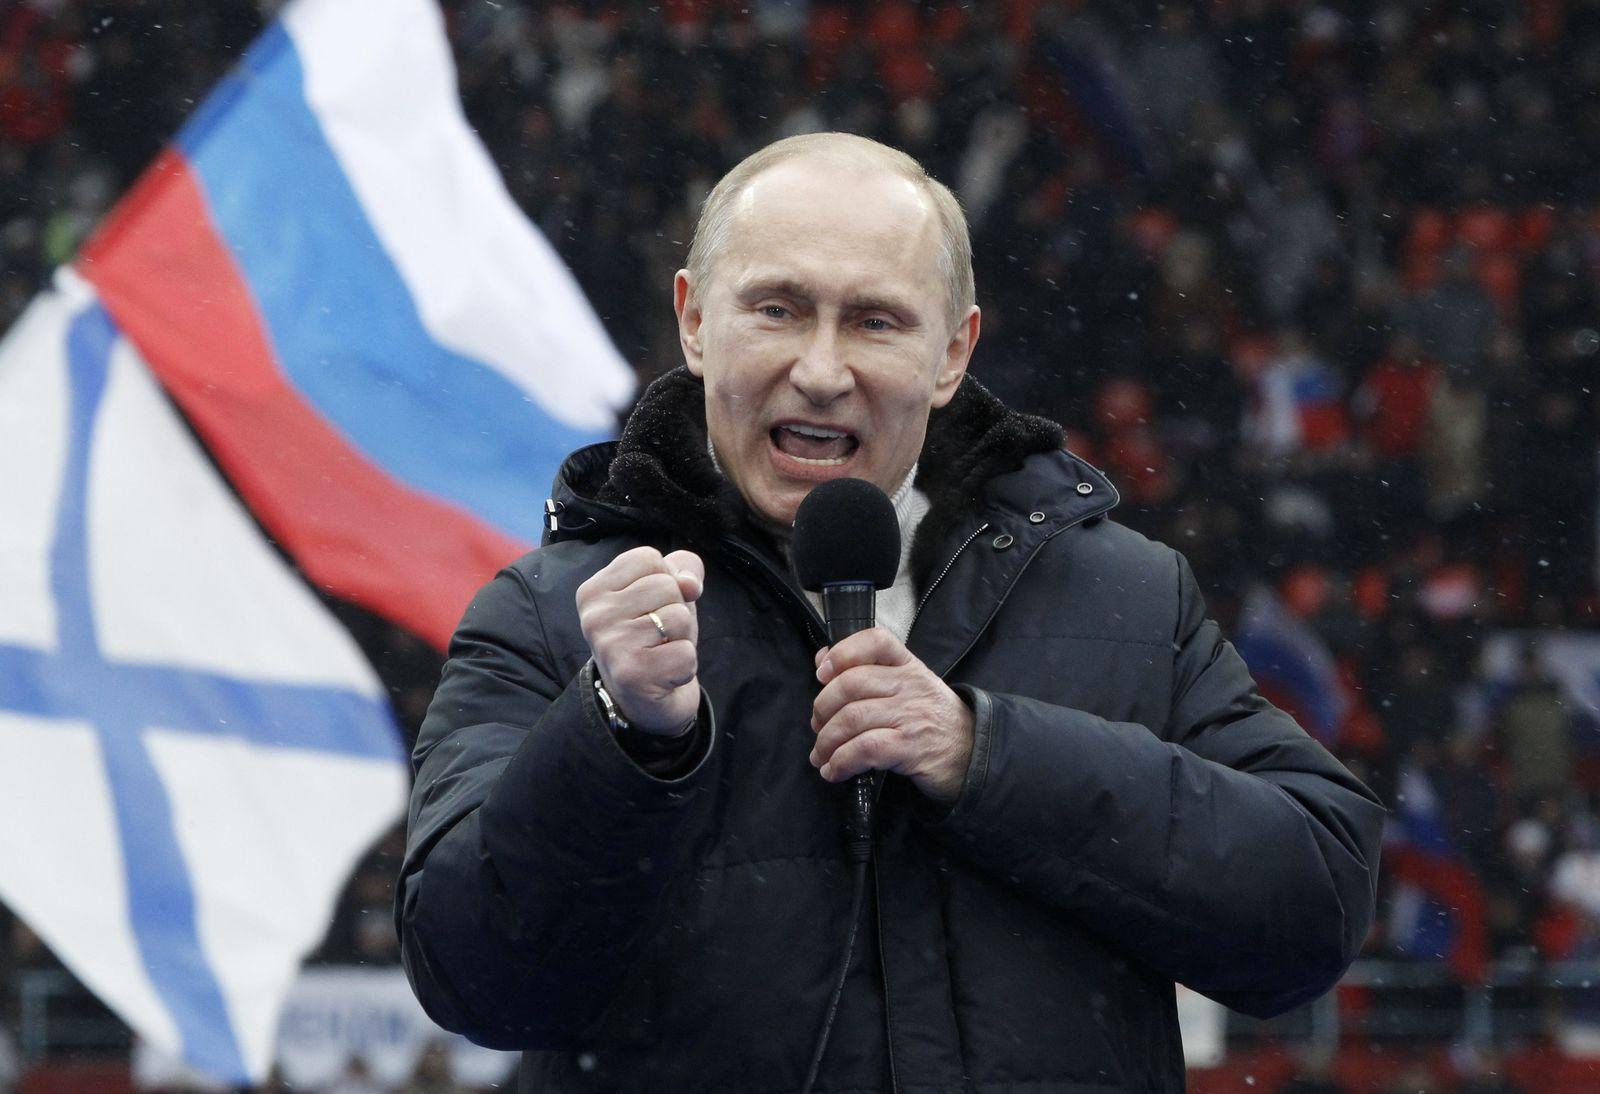 Putin / Wahlkampf